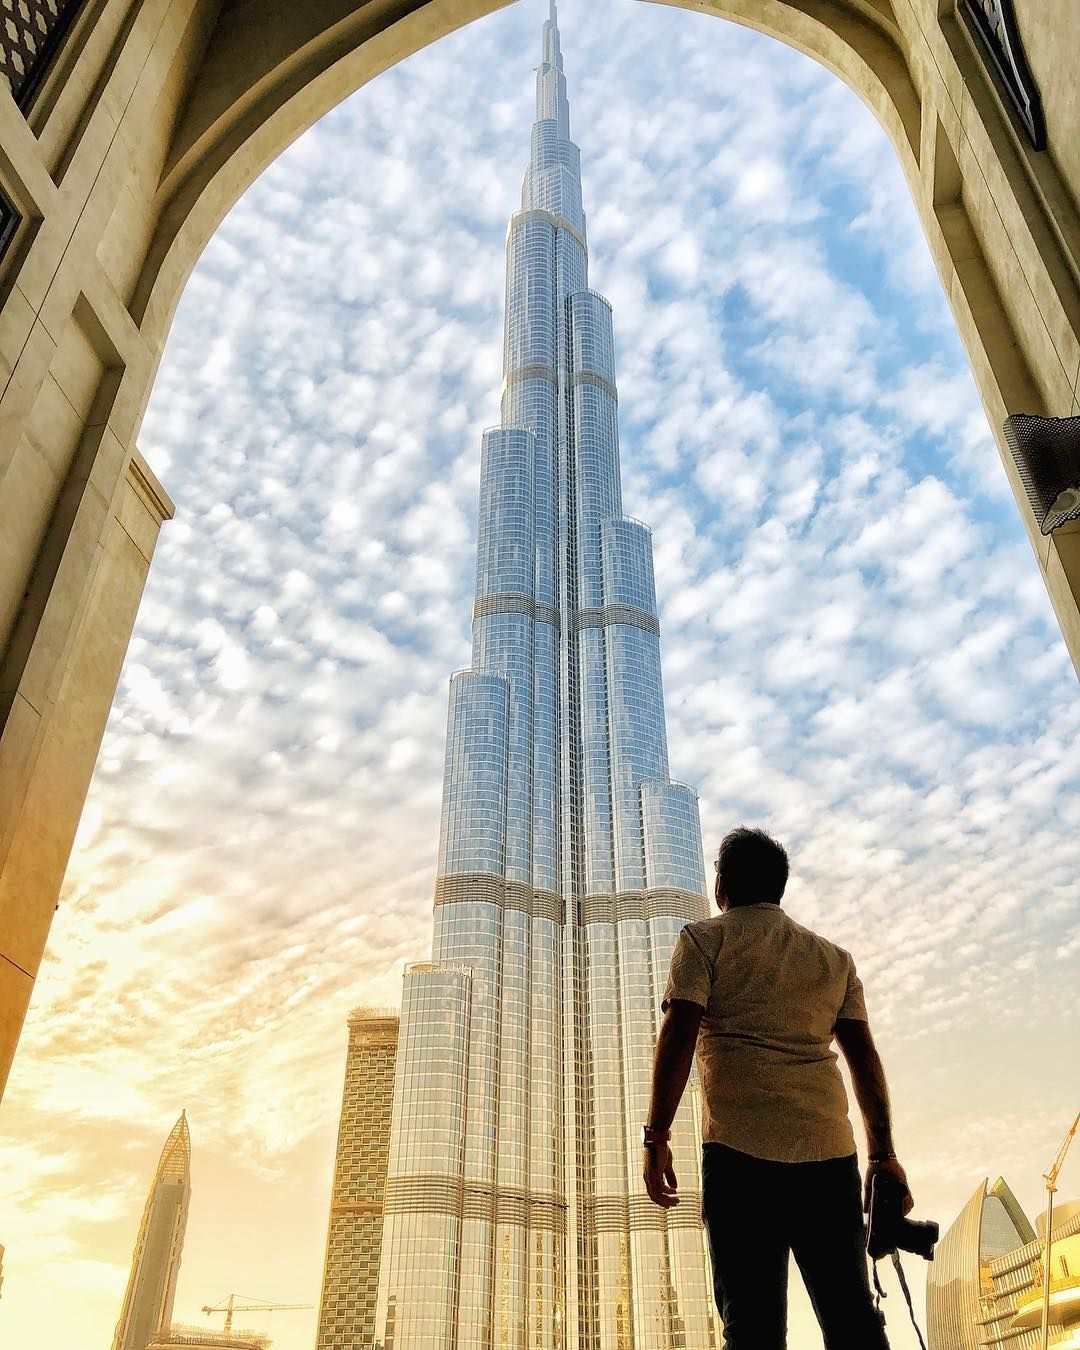 Dubai With My Bro Erikruizphoto Follow Him Erikruizphoto Burj Khalifa Dubai Travel Guide Dubai Travel